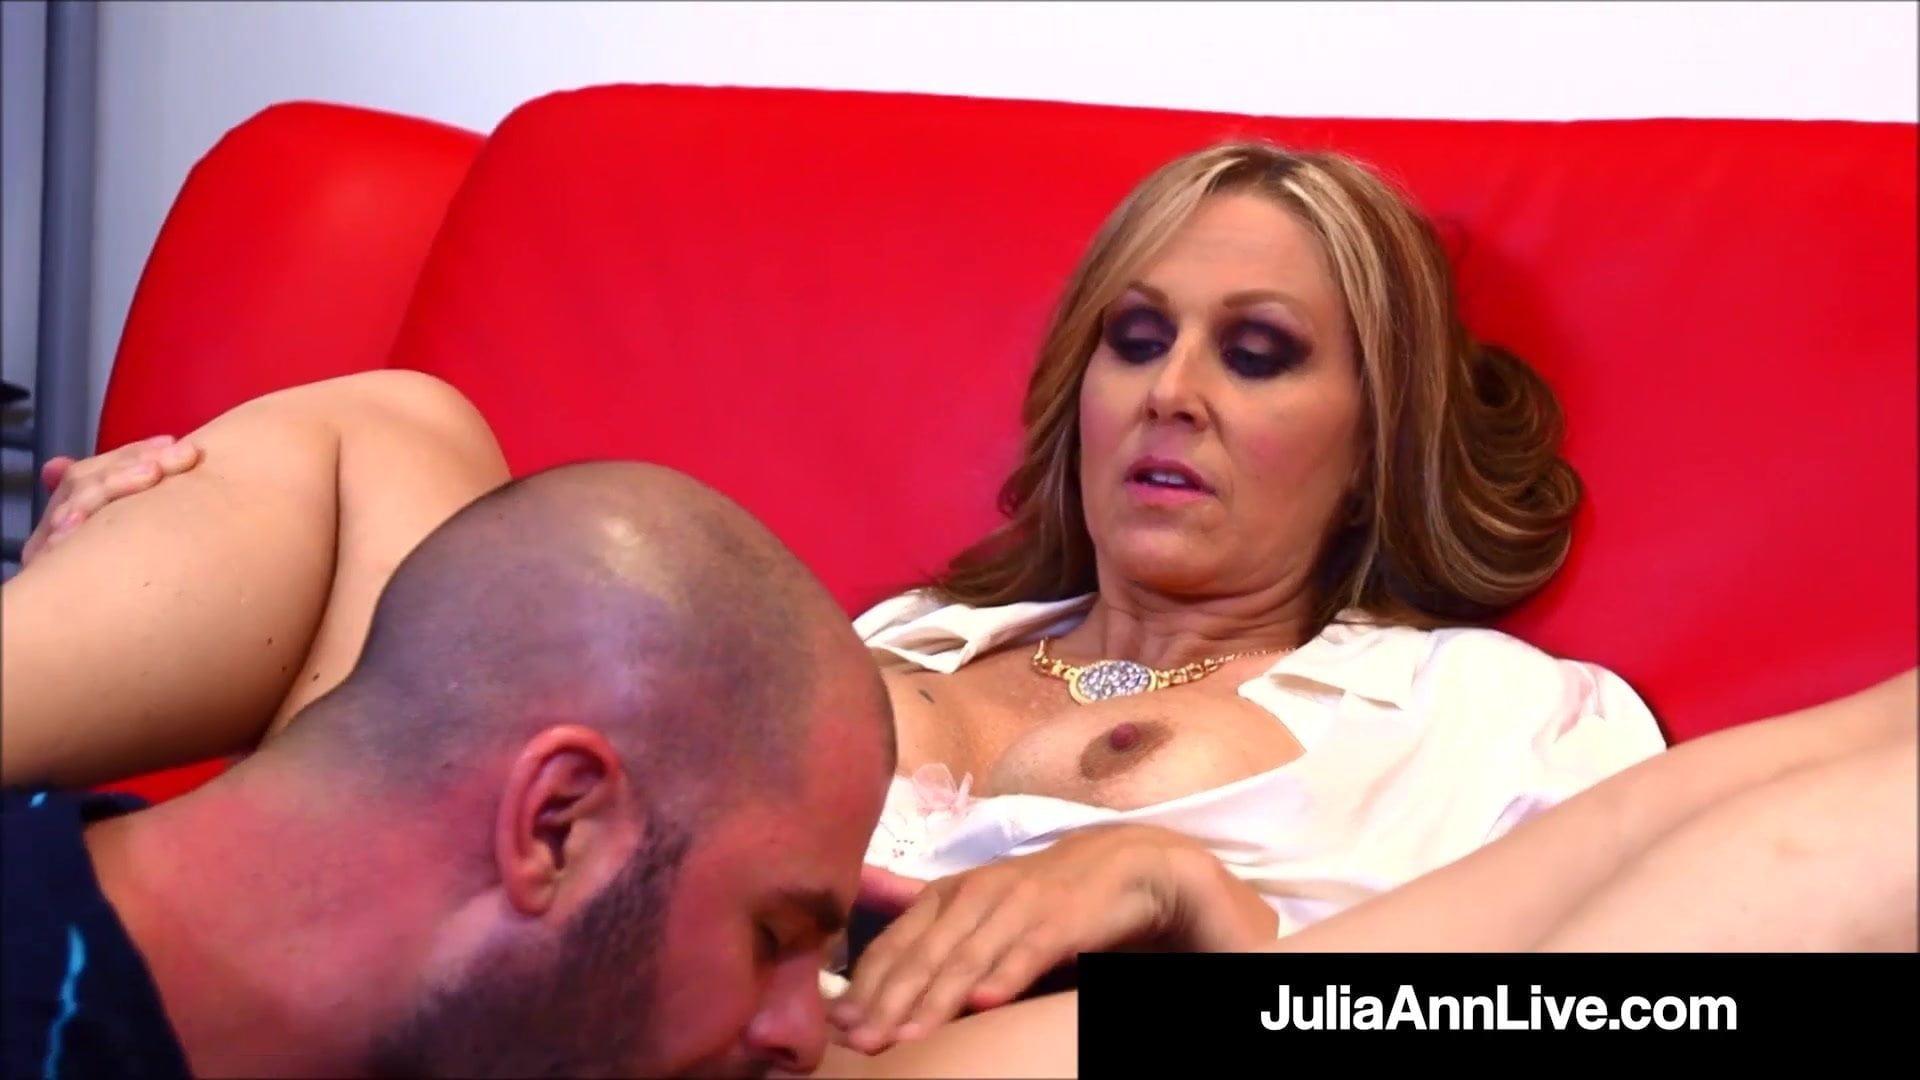 Busted teacher julia ann fucks with a student Sex Charged Teacher Julia Ann Bangs Her Hard Student Xhamster